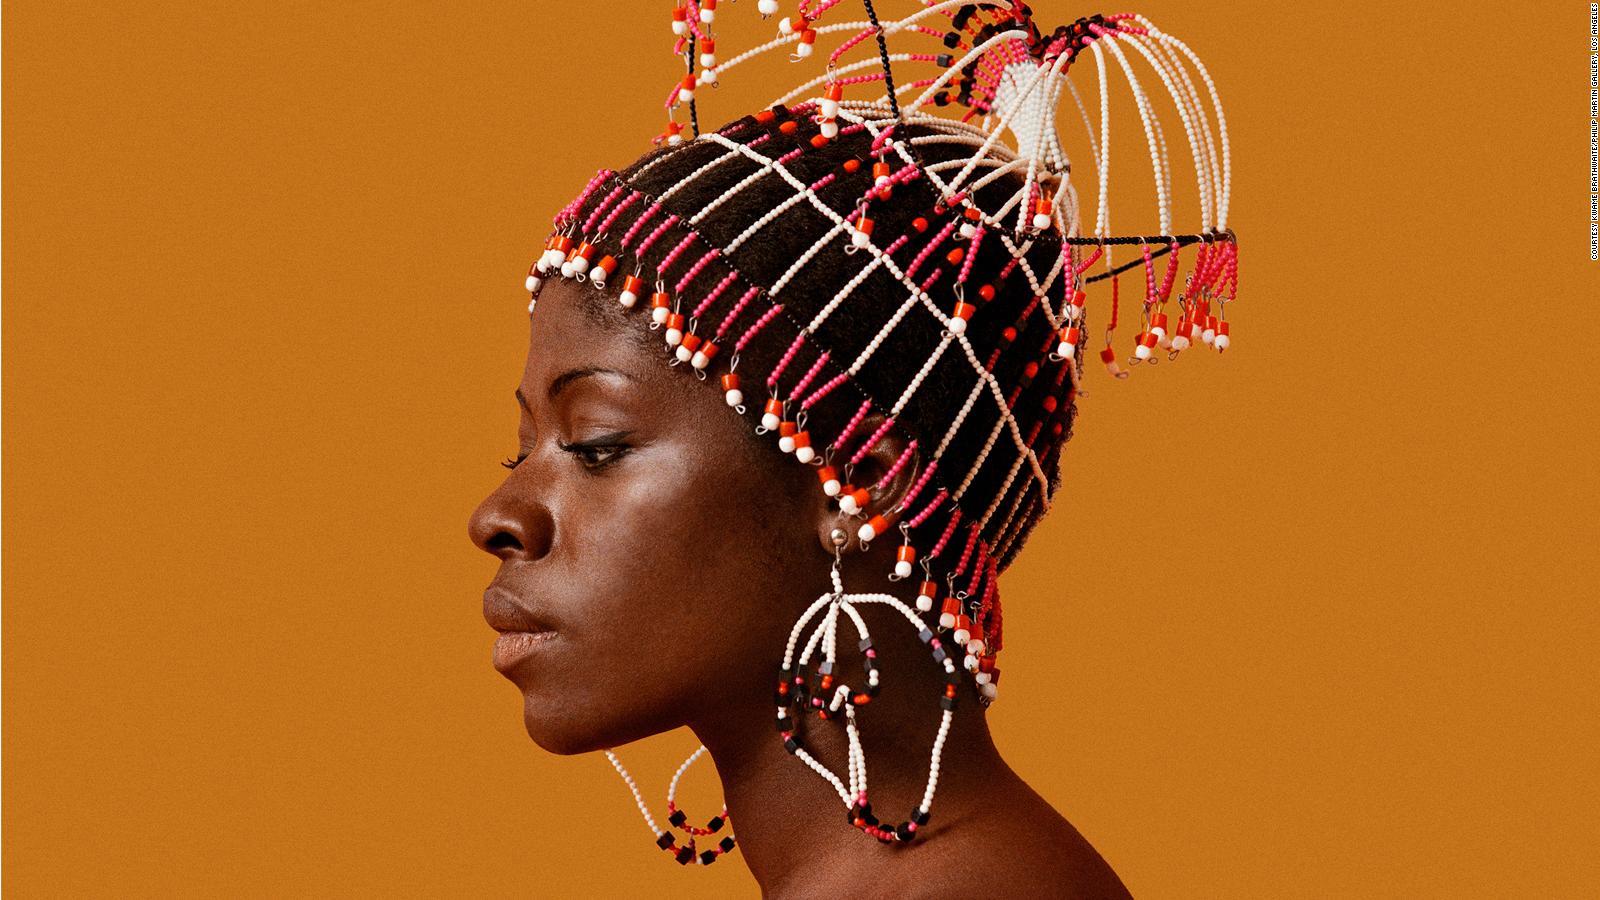 Kwame Brathwaite S Photos Of The Black Is Beautiful Movement Cnn Style